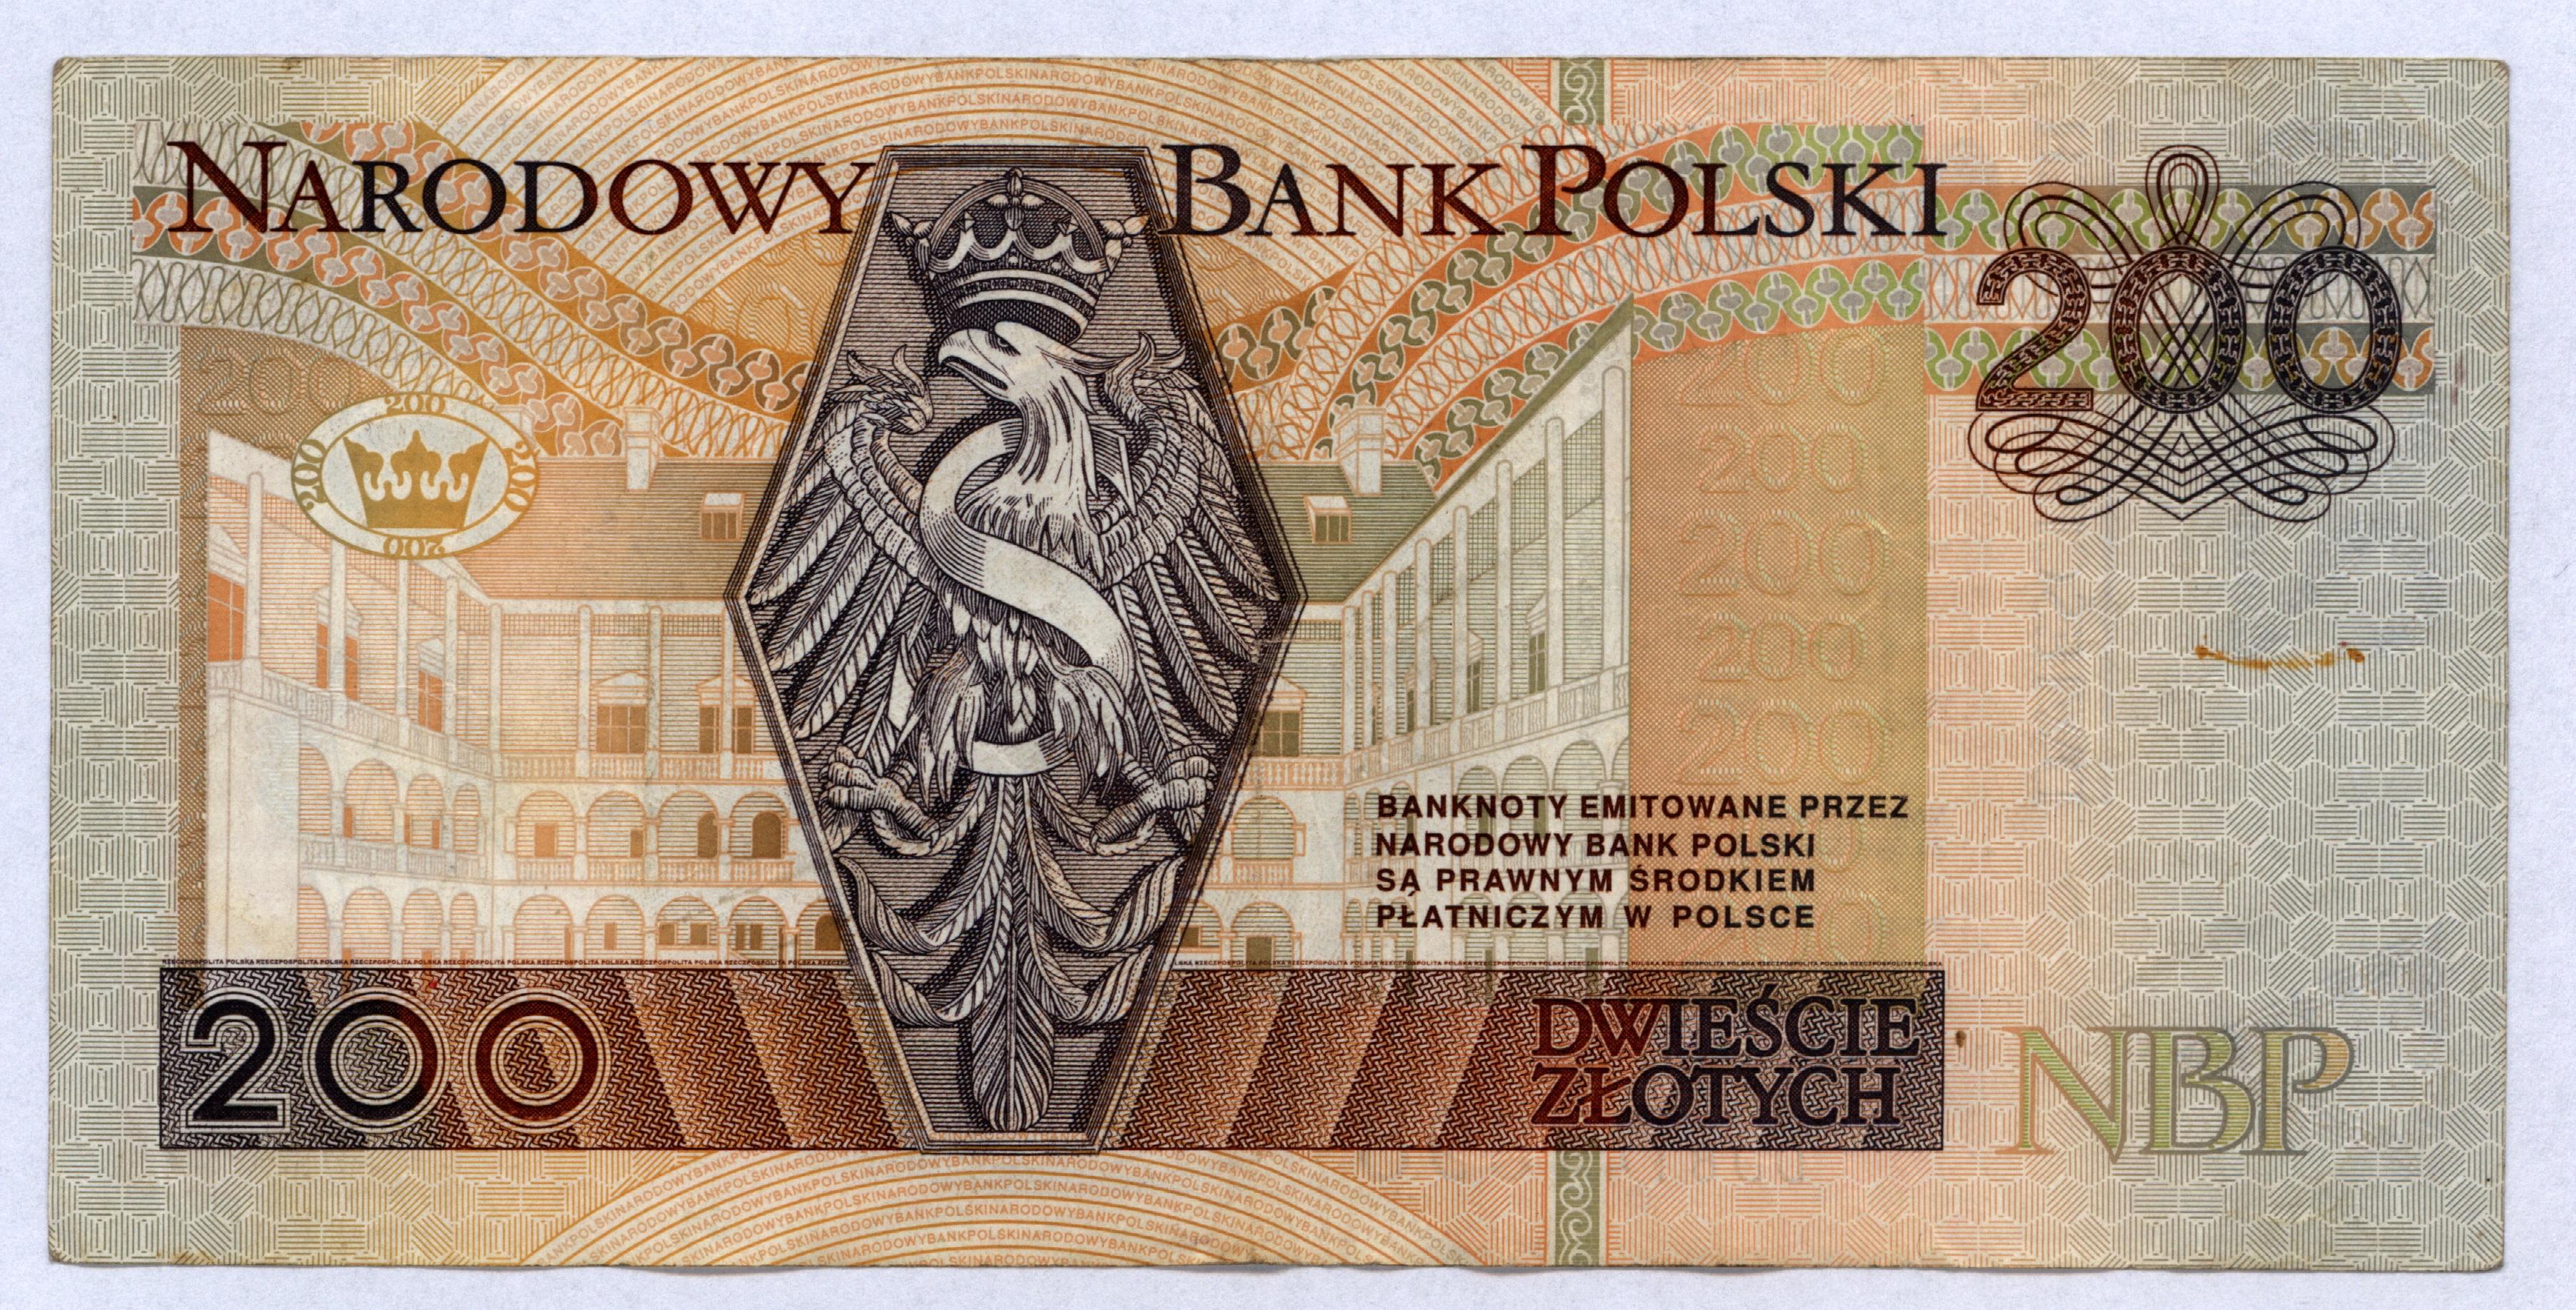 Z валюта masterforex валютные операции, форекс демо хорошая прибавка к зарплате eb_cams_panama